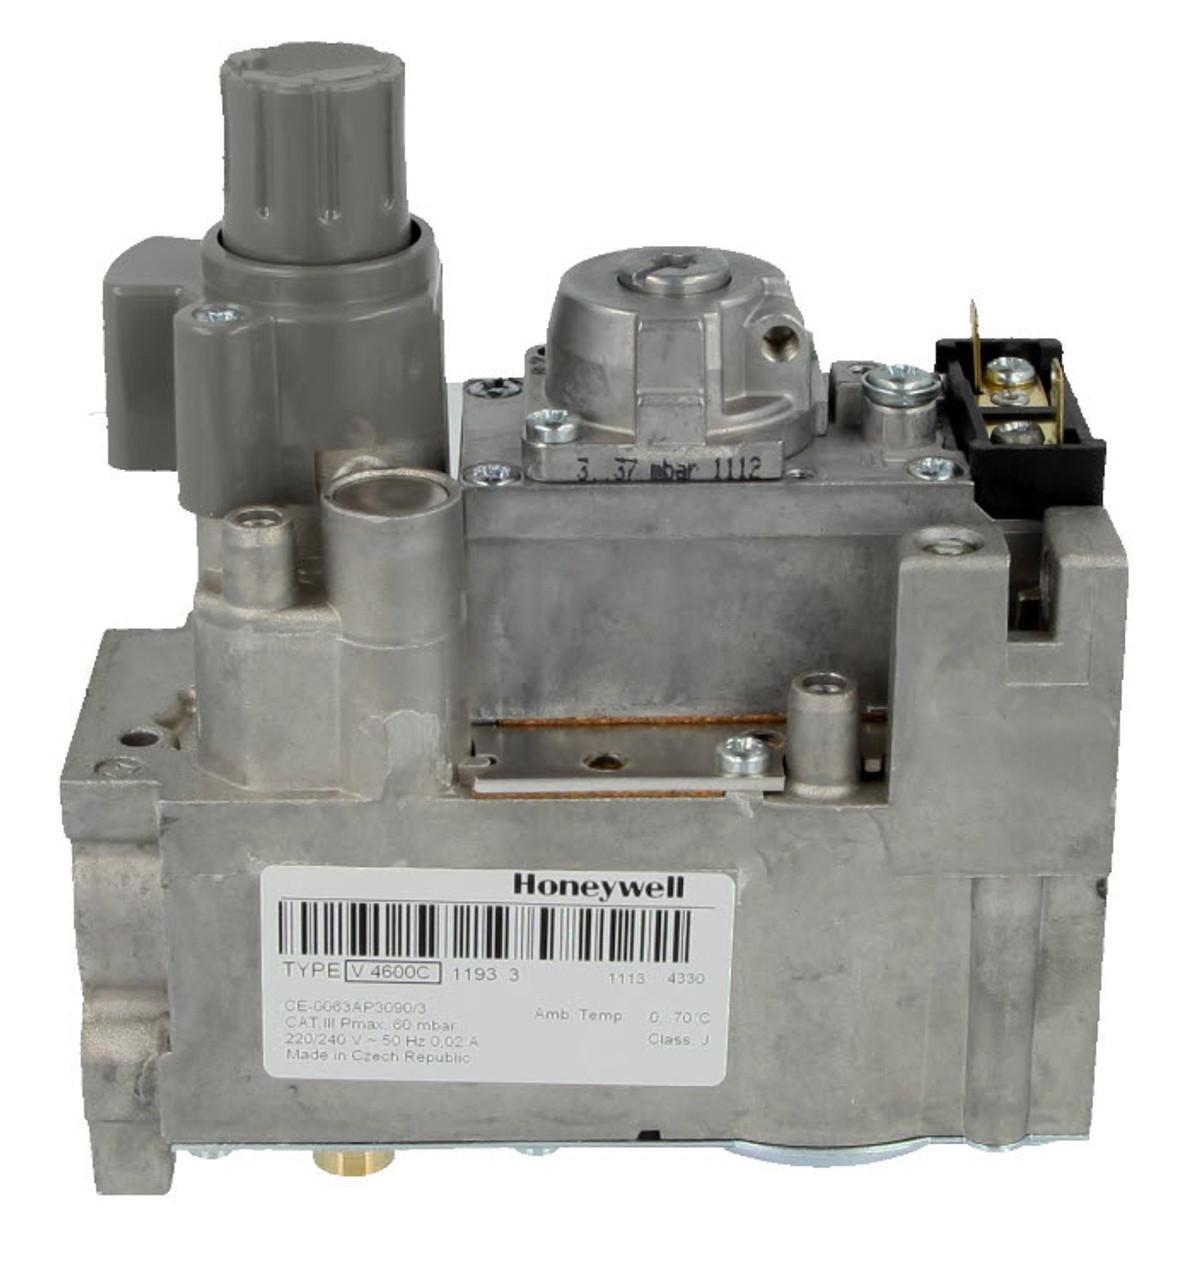 Honeywell V4600C1193U Compact Gas control block